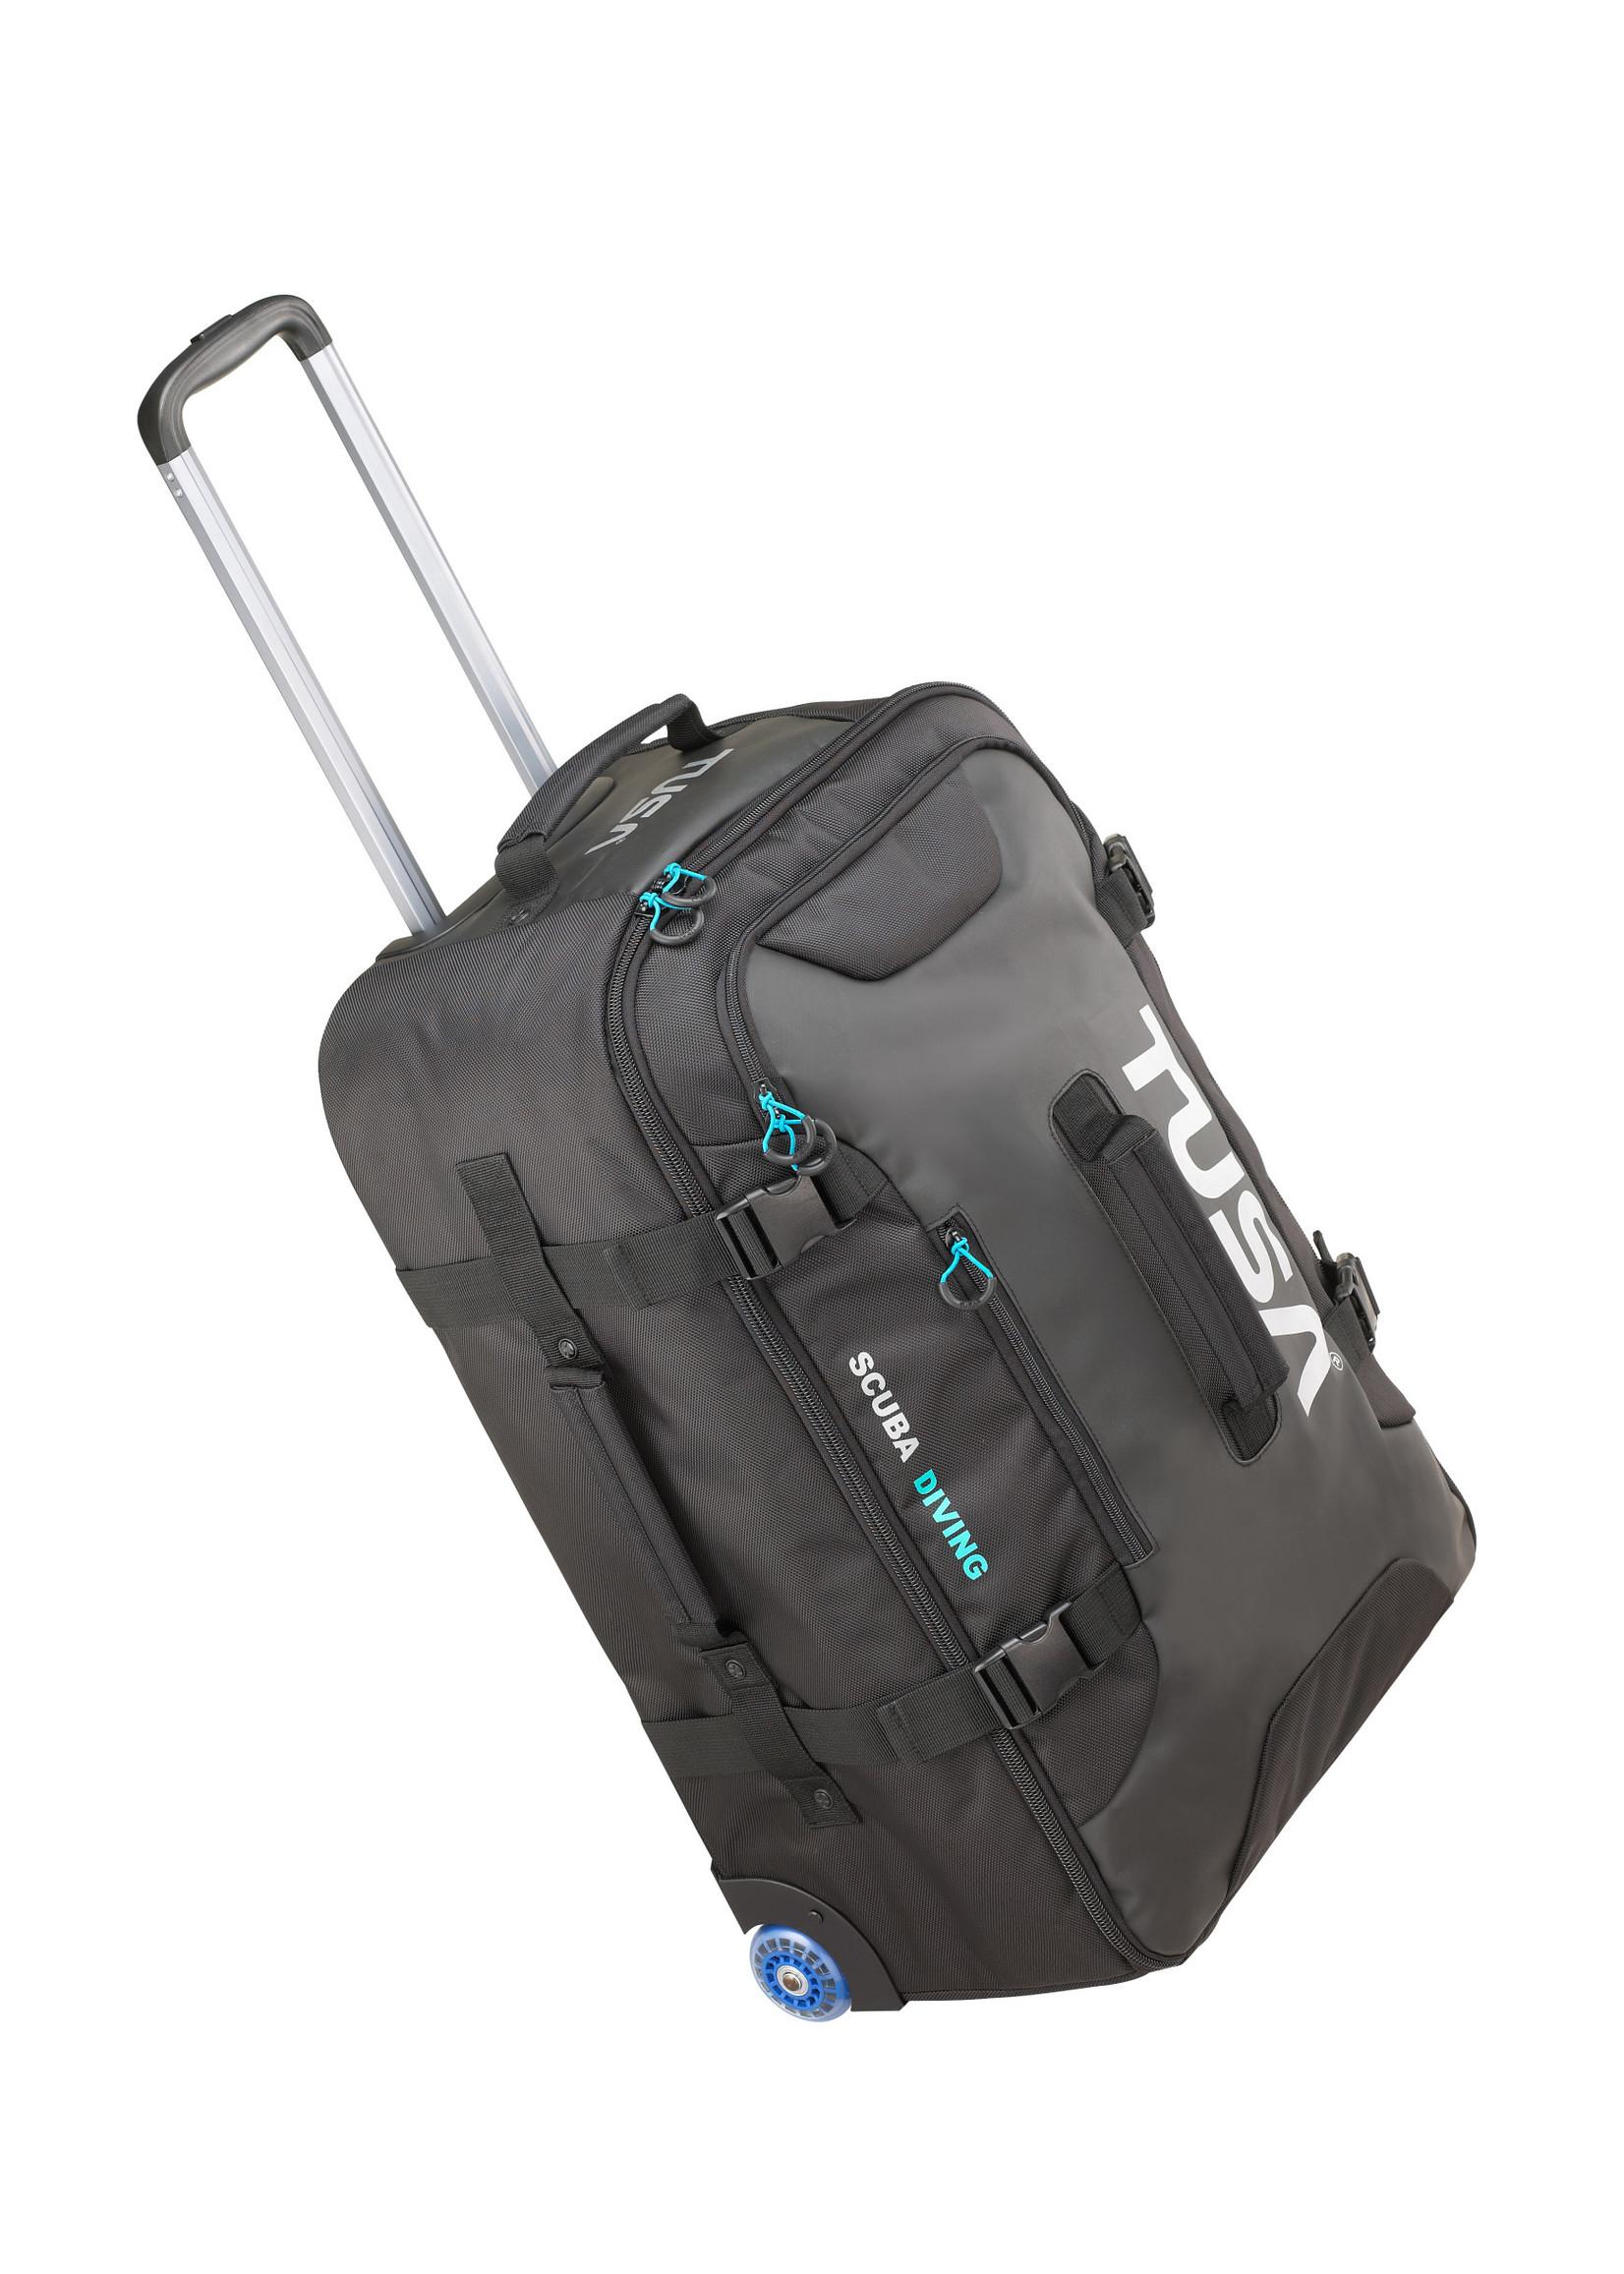 TUSA TUSA Roller Bag 81L